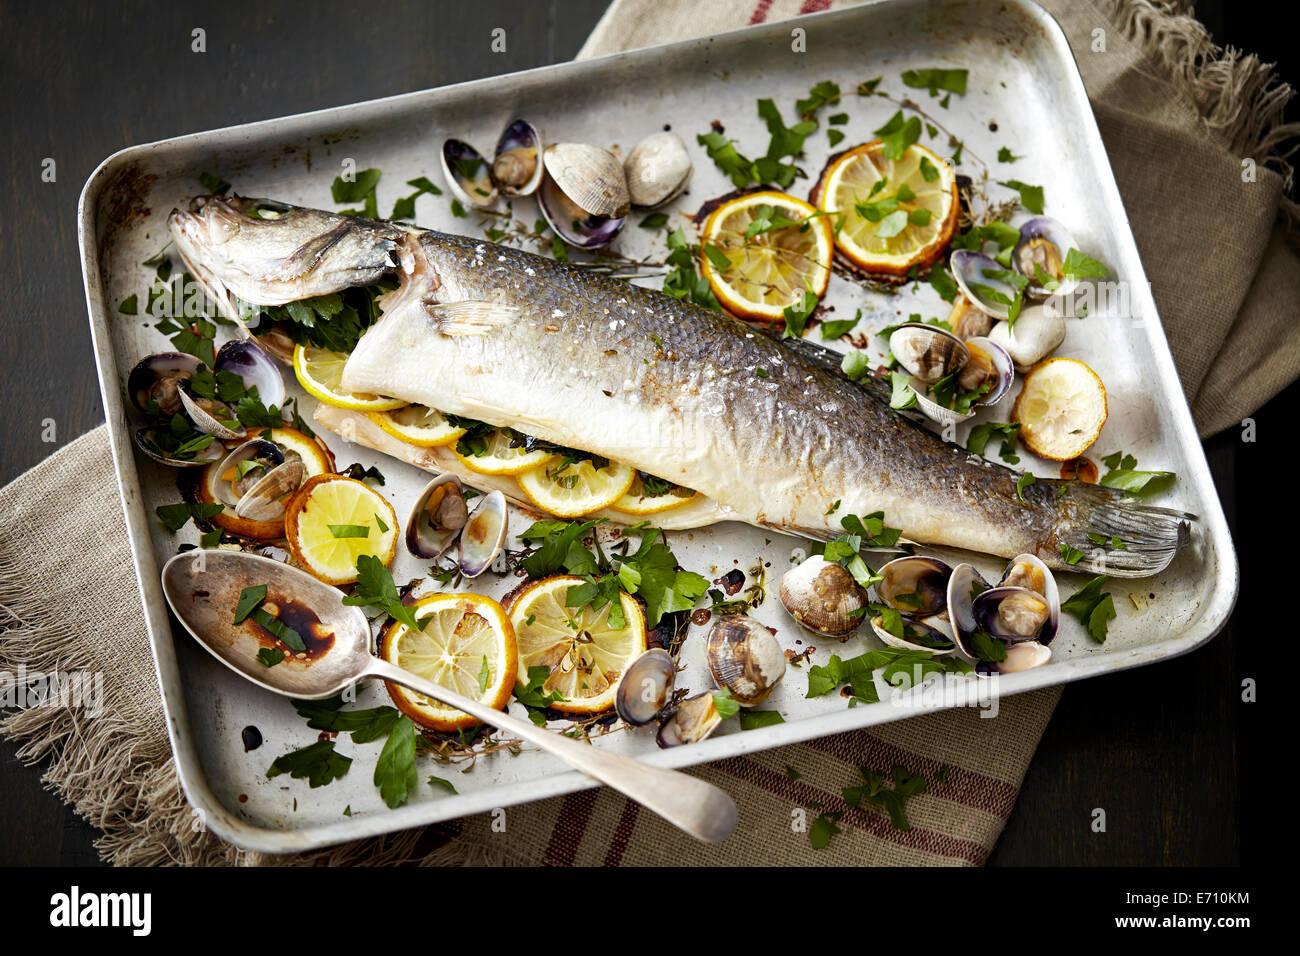 Bandeja para hornear con rellenos de pescado cocido con limón y hierbas Imagen De Stock